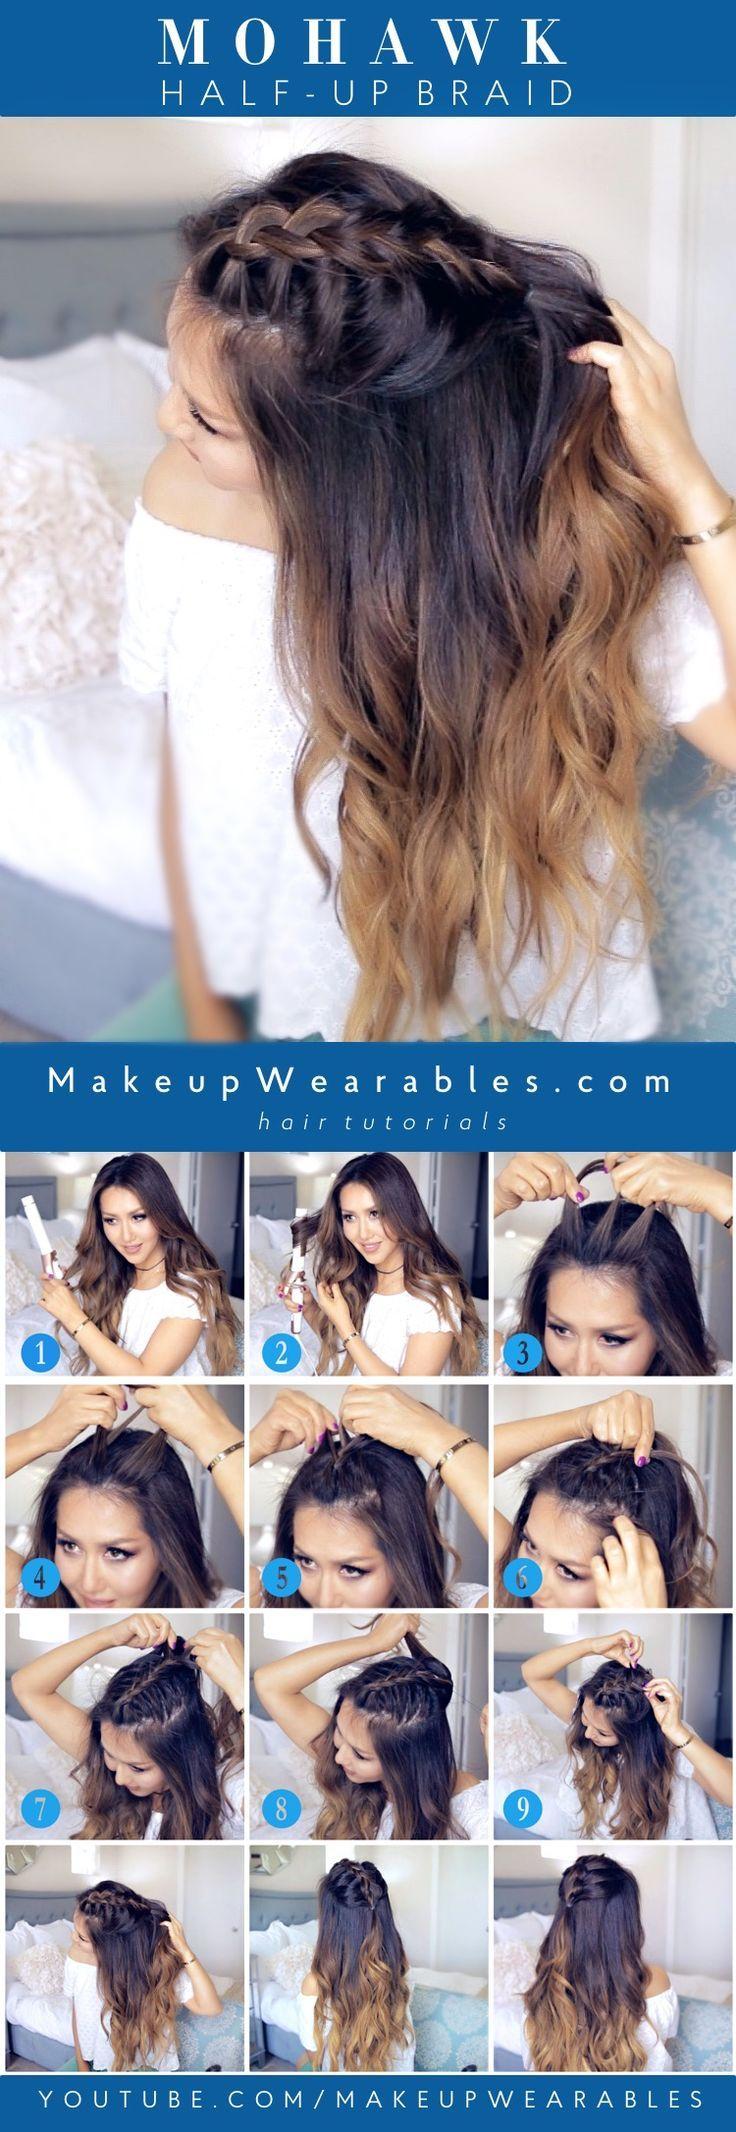 Cool romantic mohawk braid tutorial with nexxus hair styles